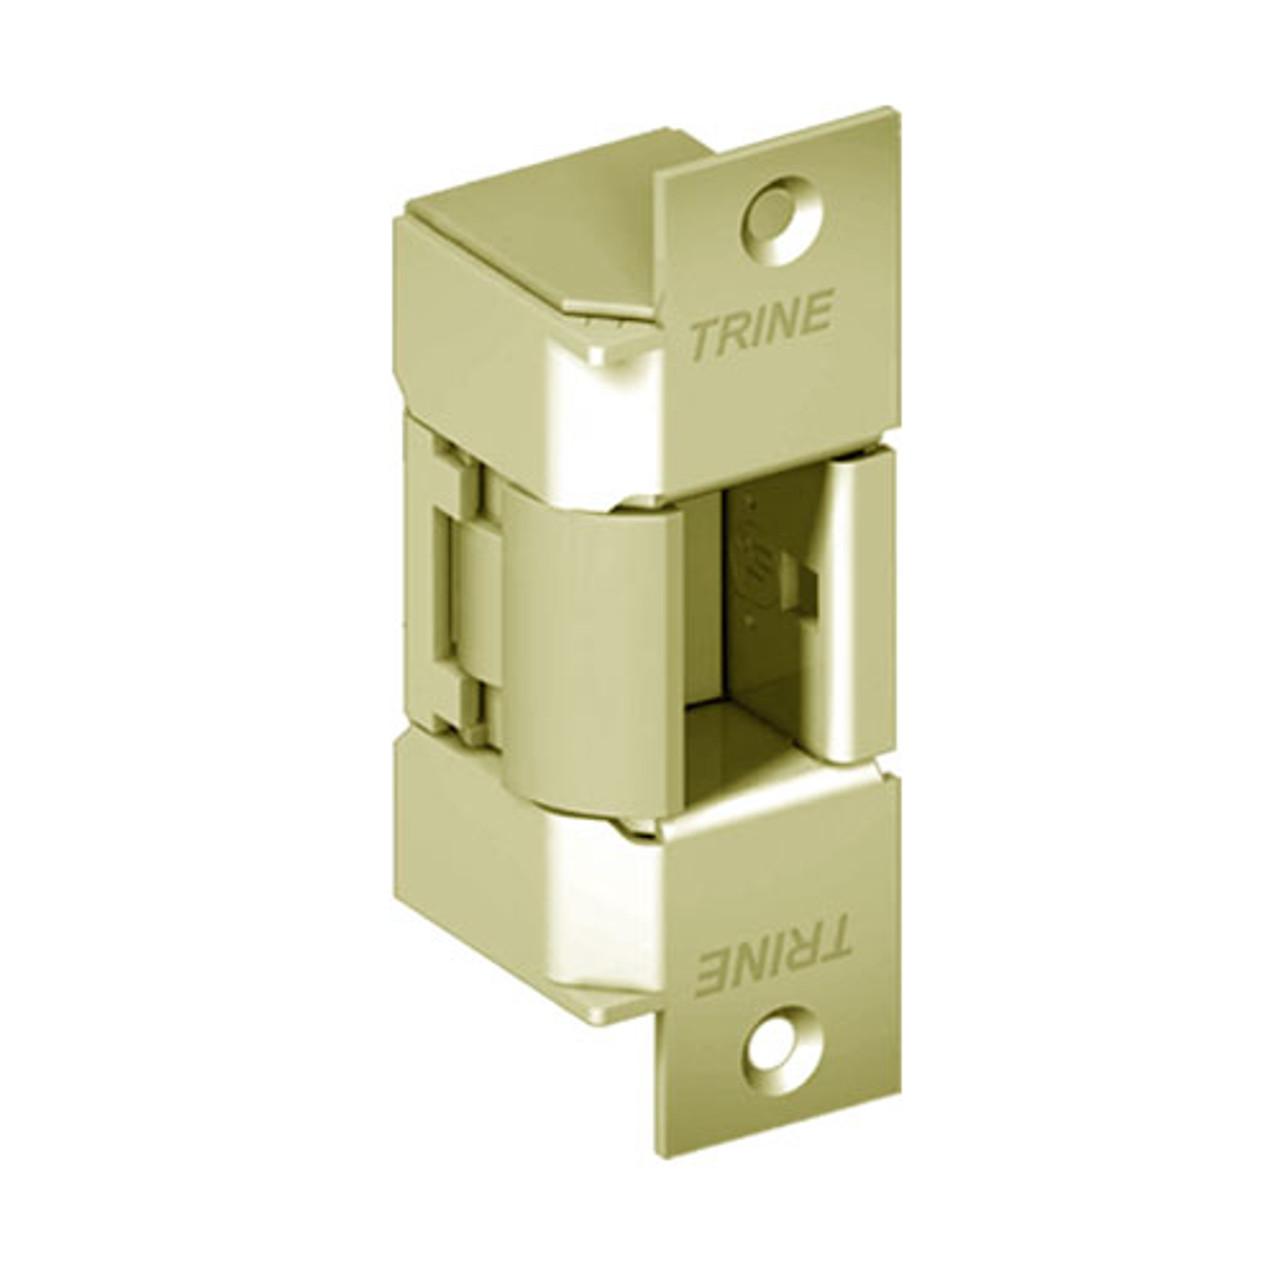 EN400-24DC-US4-RH Trine EN Series Outdoor Electric Strikes Solution in Satin Brass Finish